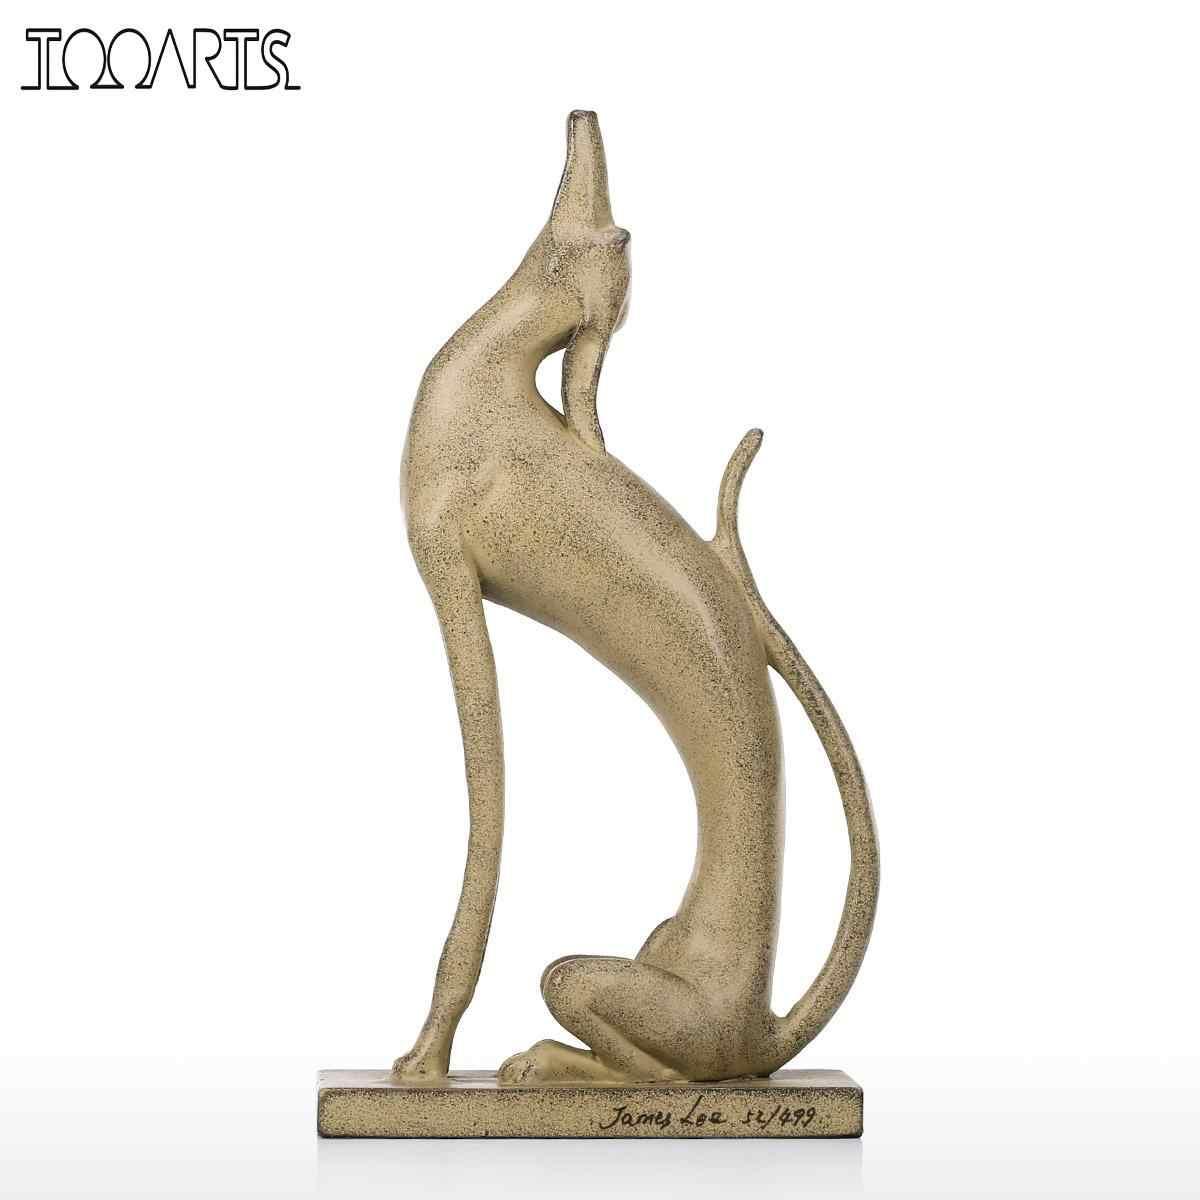 Tooarts Aluminum Animal Statue Upturned Dog Sculpture Art Statue Home Decoration Contemporary Table Art Sculpture Home Decor Statues Sculptures Aliexpress